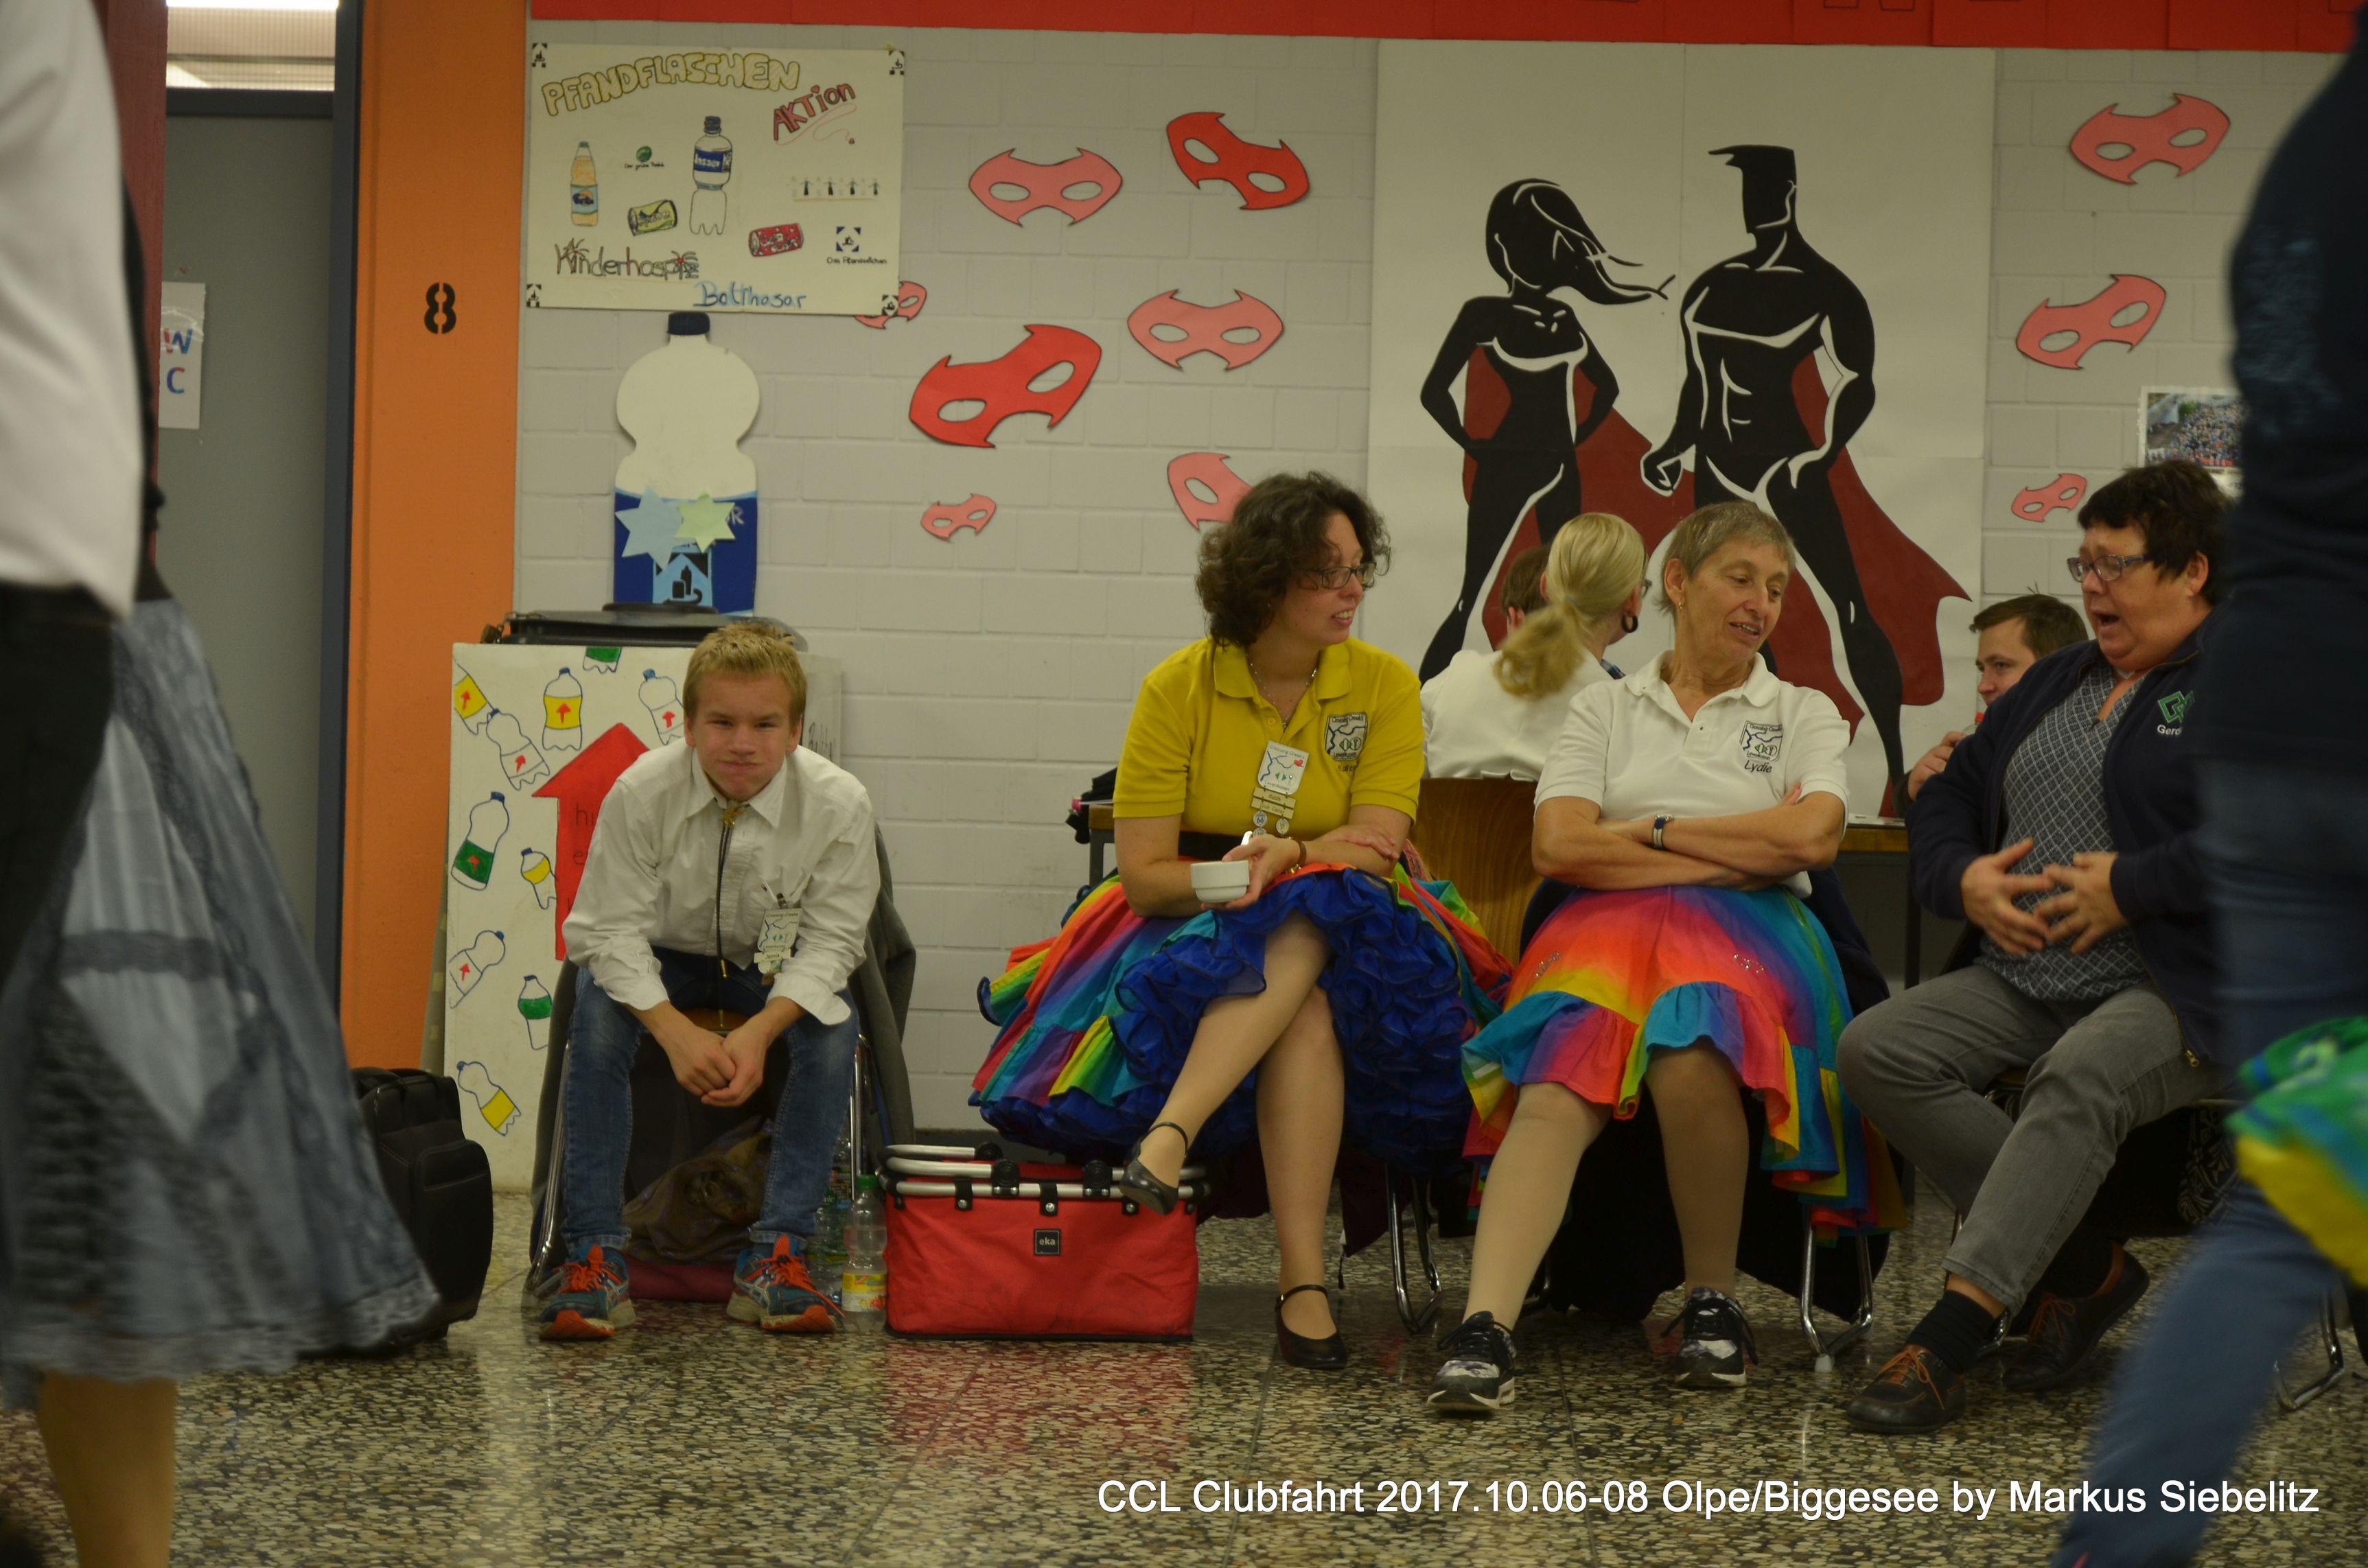 CCL Clubfahrt 2017.10.06-08 Biggesee (62)